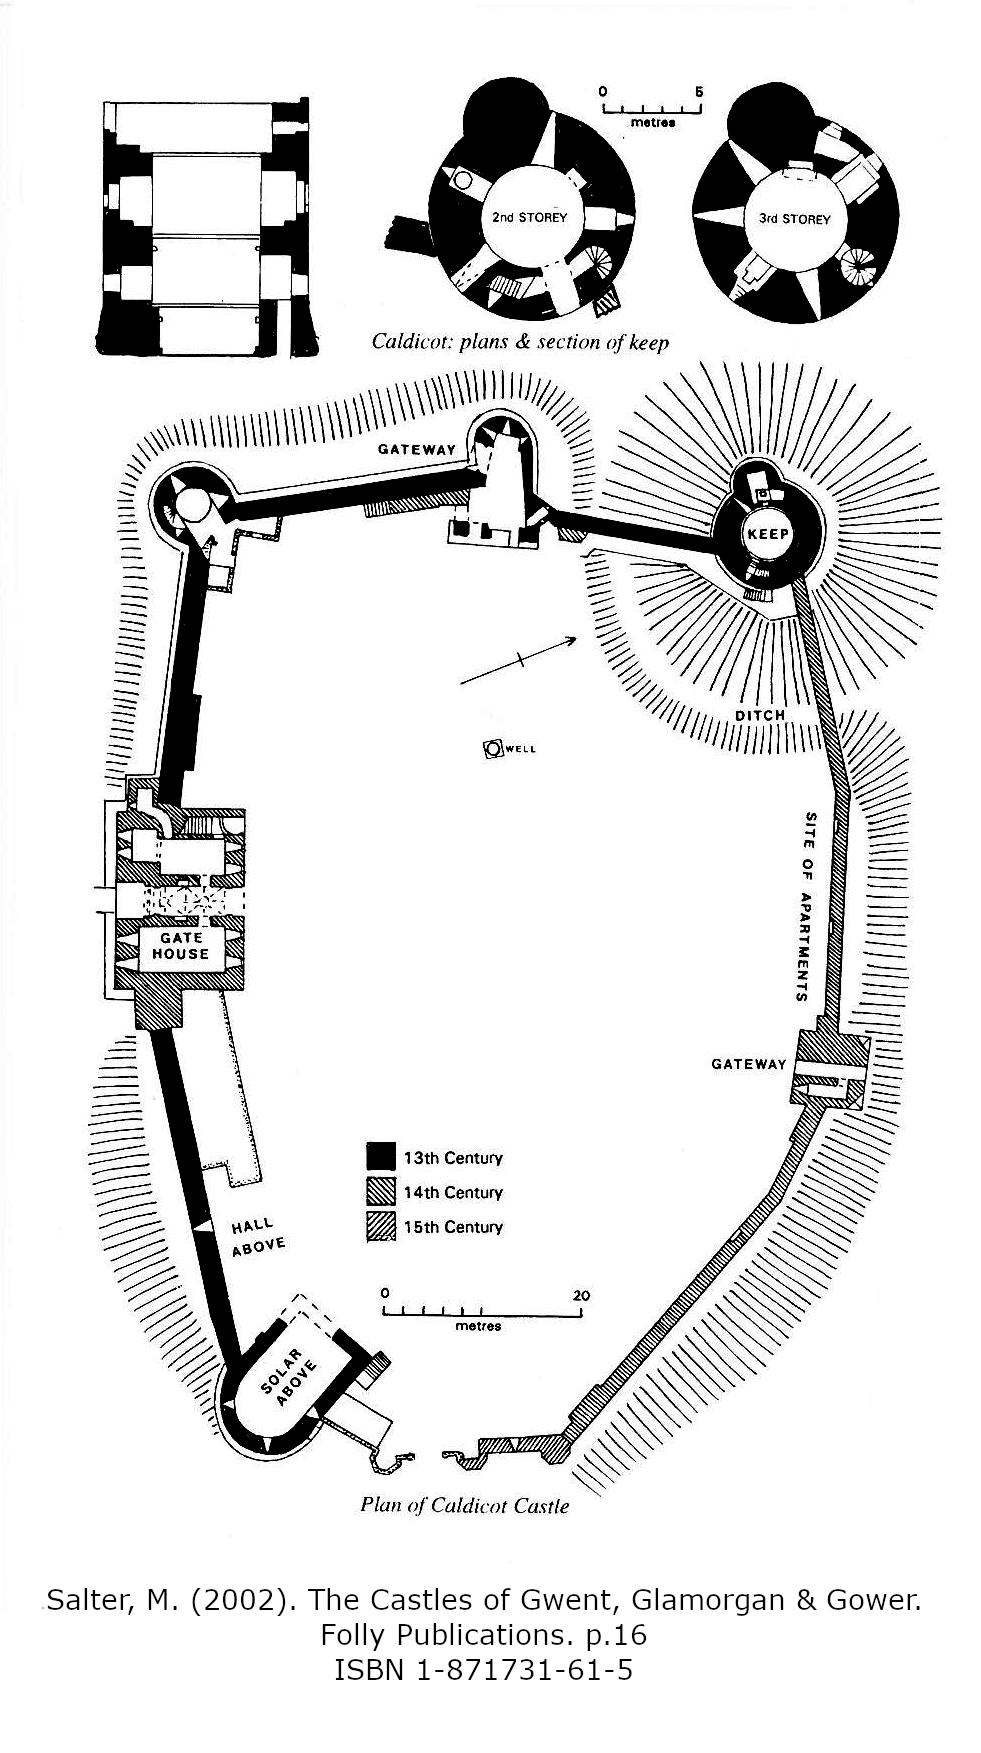 Caldicot Castle Monmouthshire Wales Site Plan